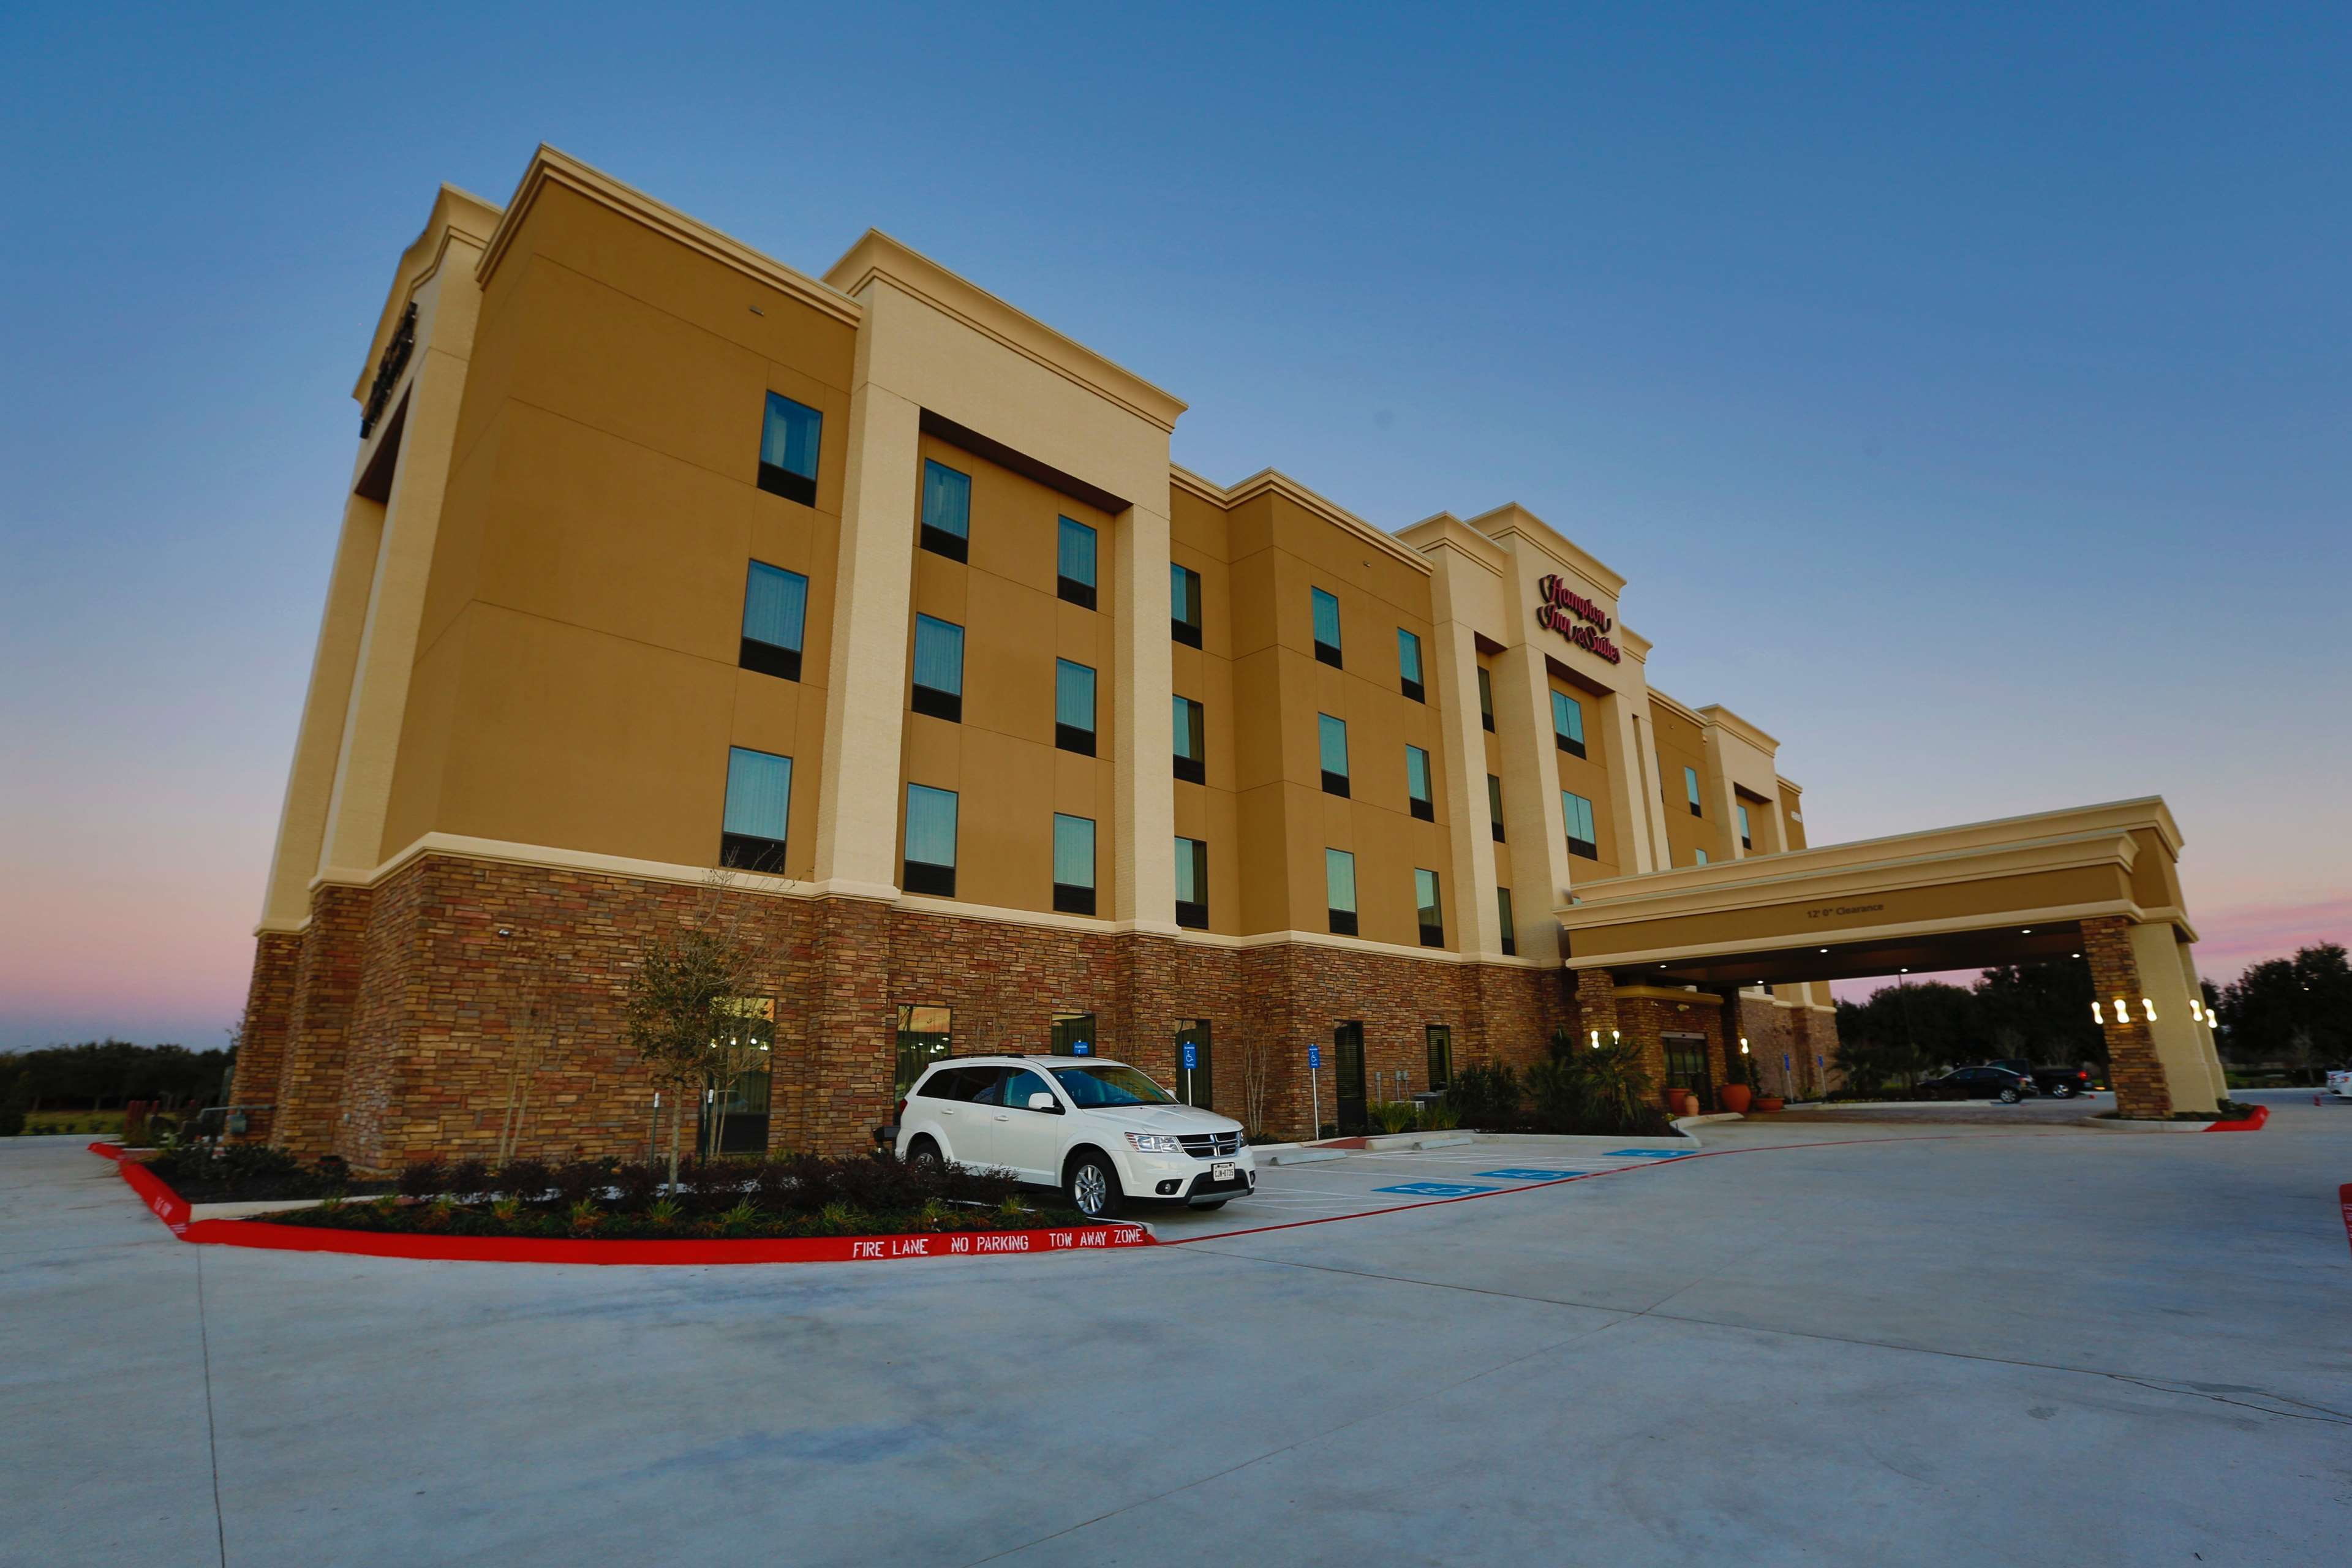 Hampton Inn & Suites Missouri City, TX image 1